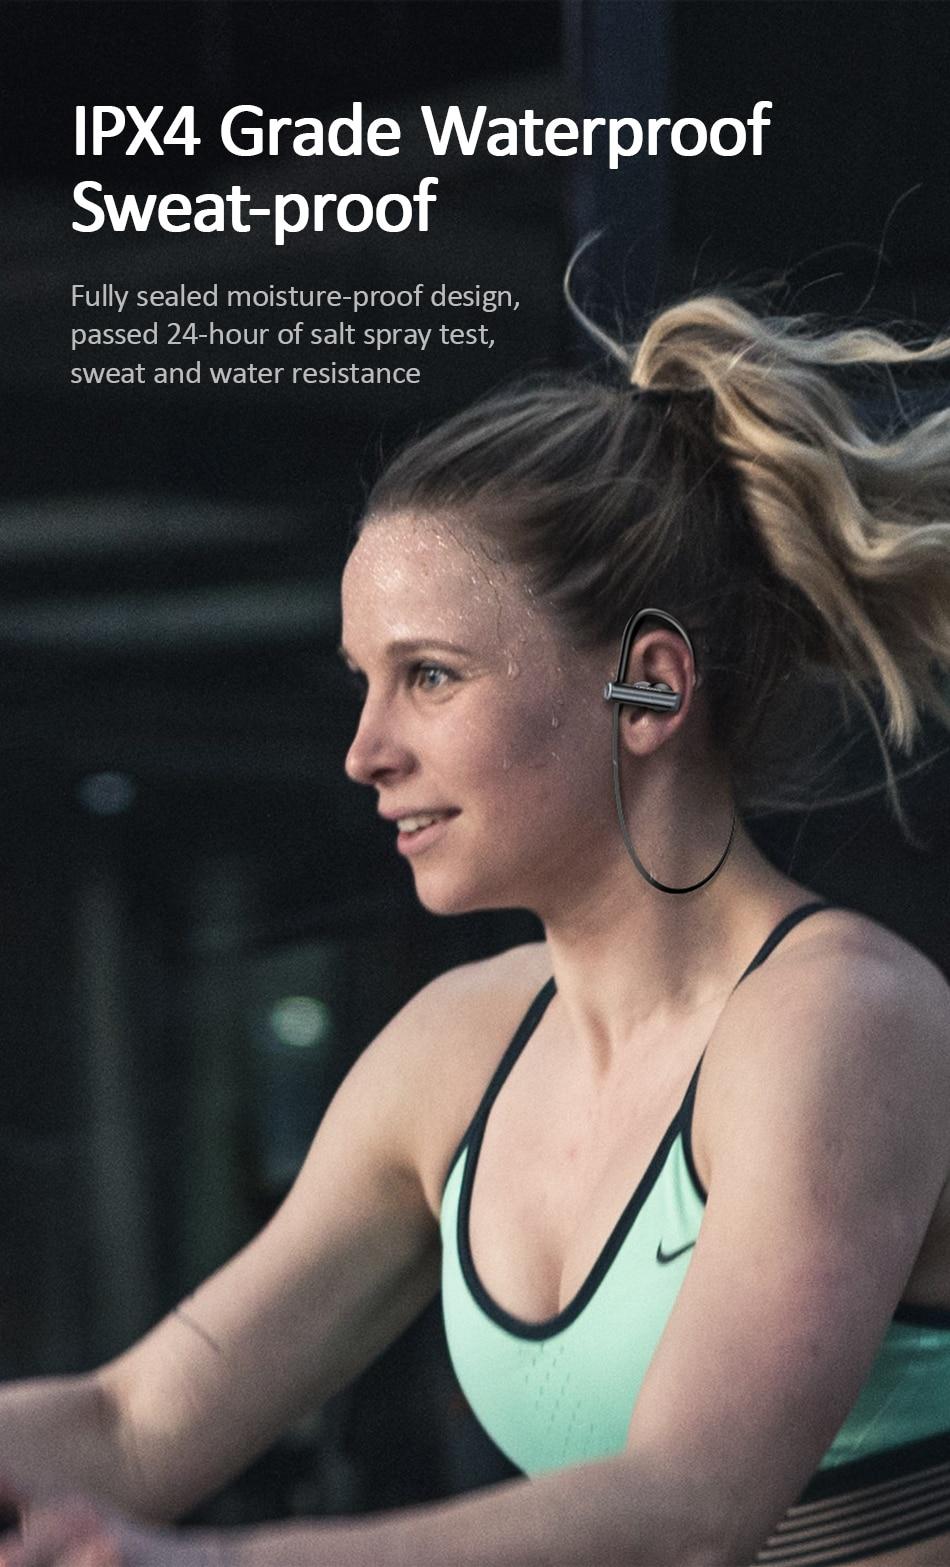 20201010-US-YD004-S4-Sport系列-蓝牙运动耳机-950px_04